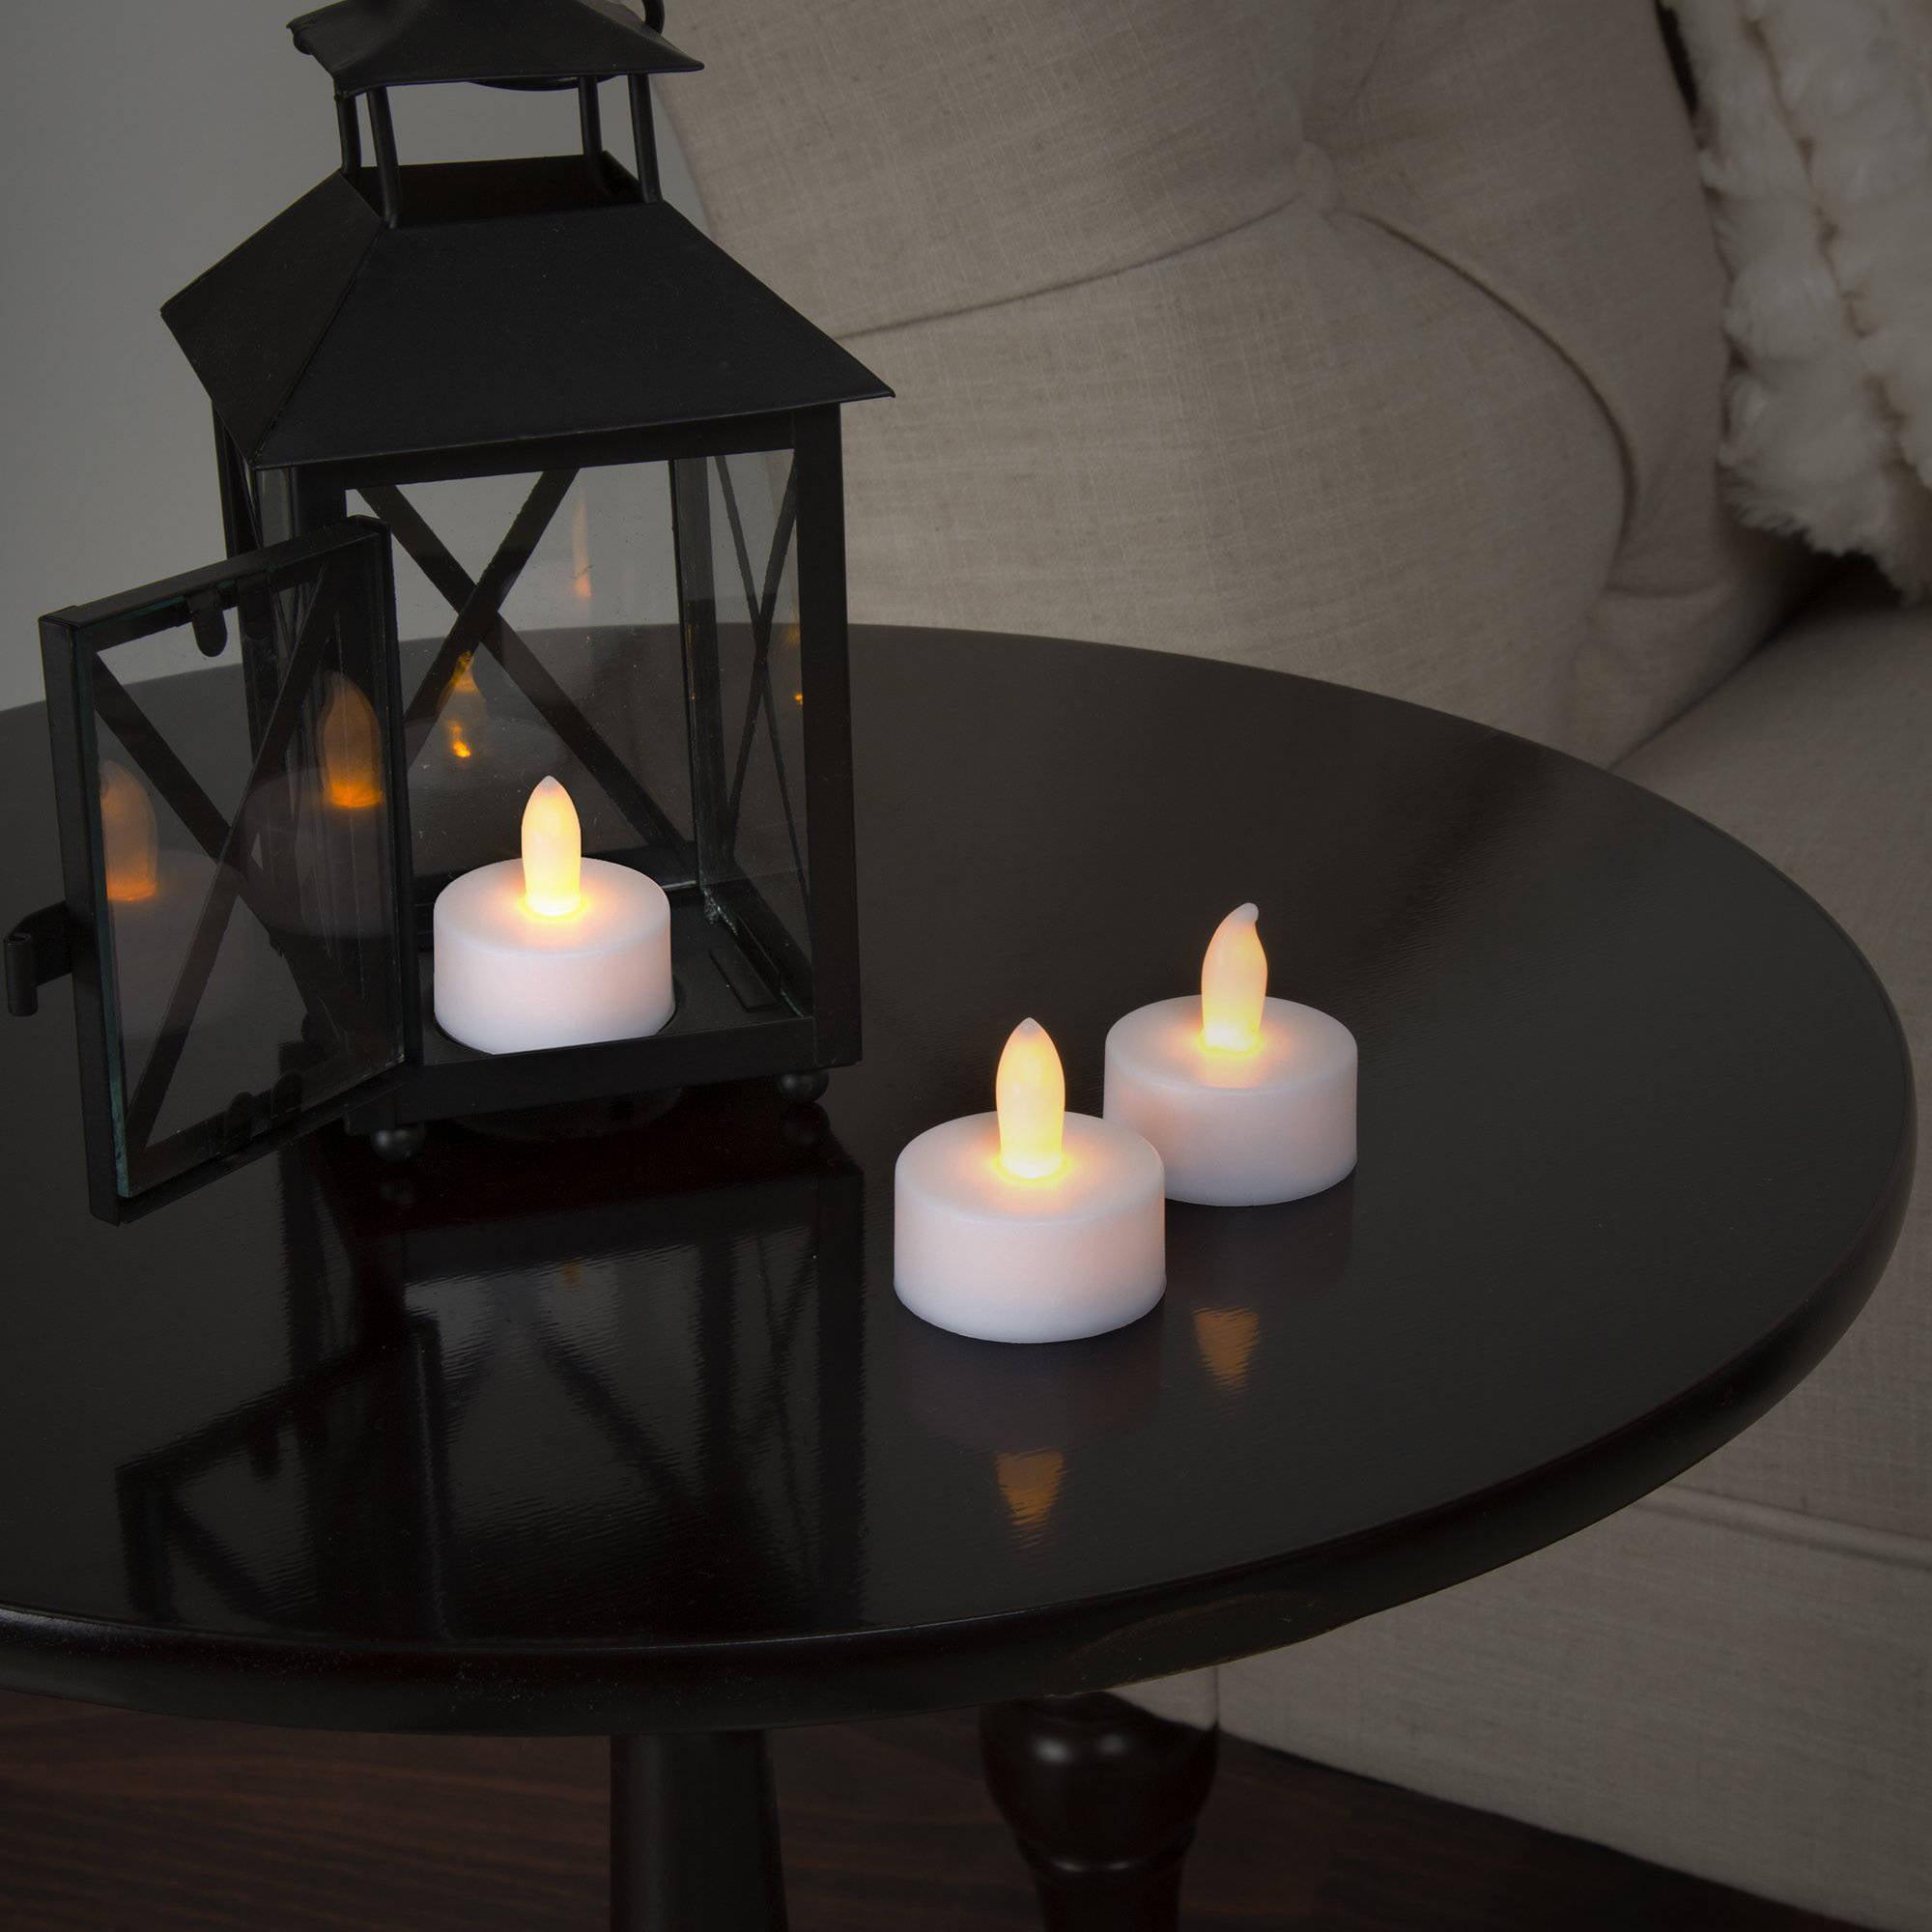 Lavish Home 24-Piece LED Tea Light Candle Set